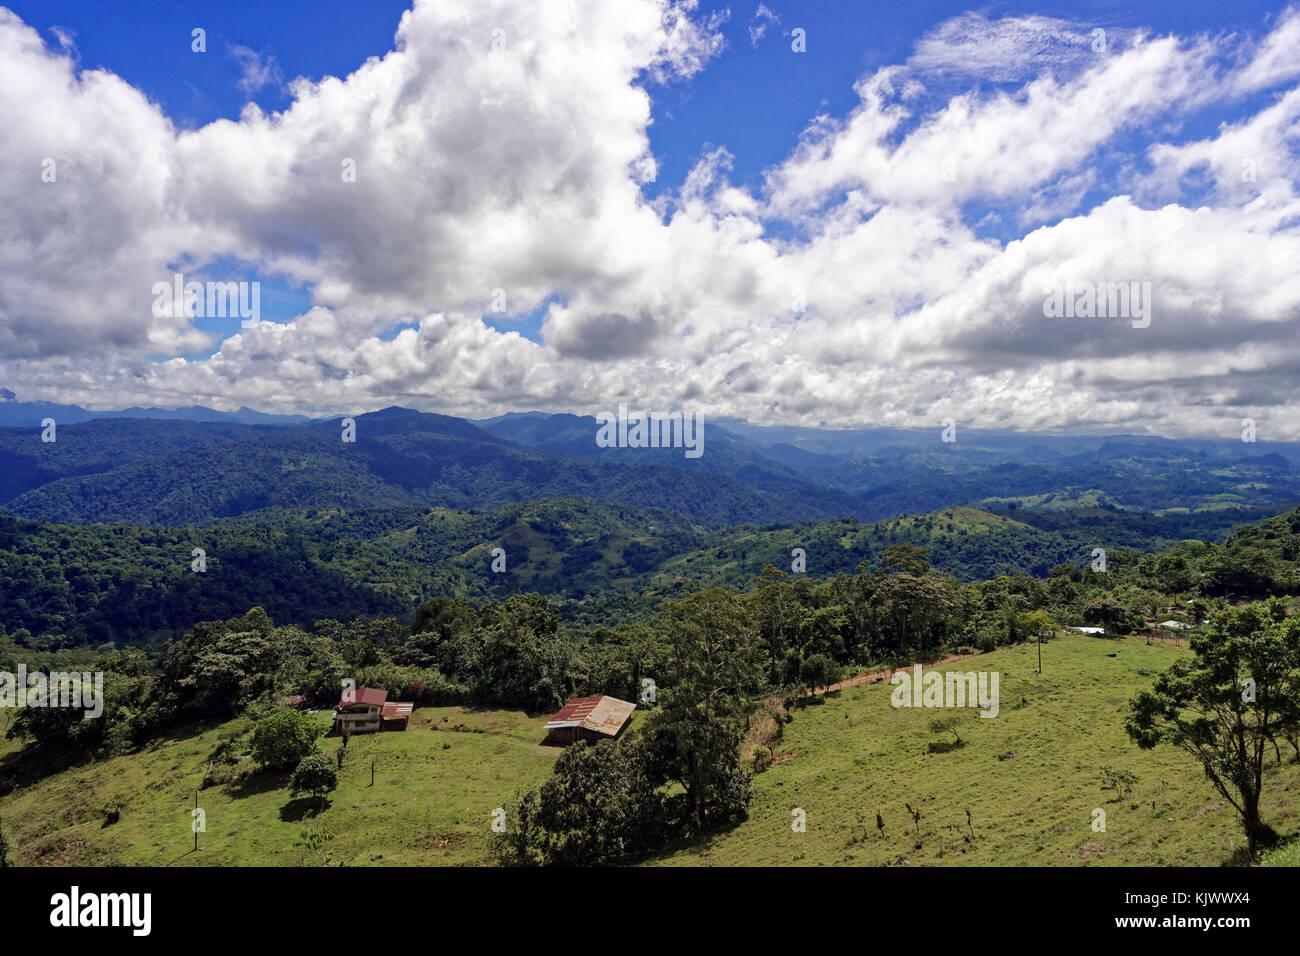 The mountain range Cordillera de Talamanca provides scenic views on meadows, farmhouses. Some clouds in the sky. - Stock Image